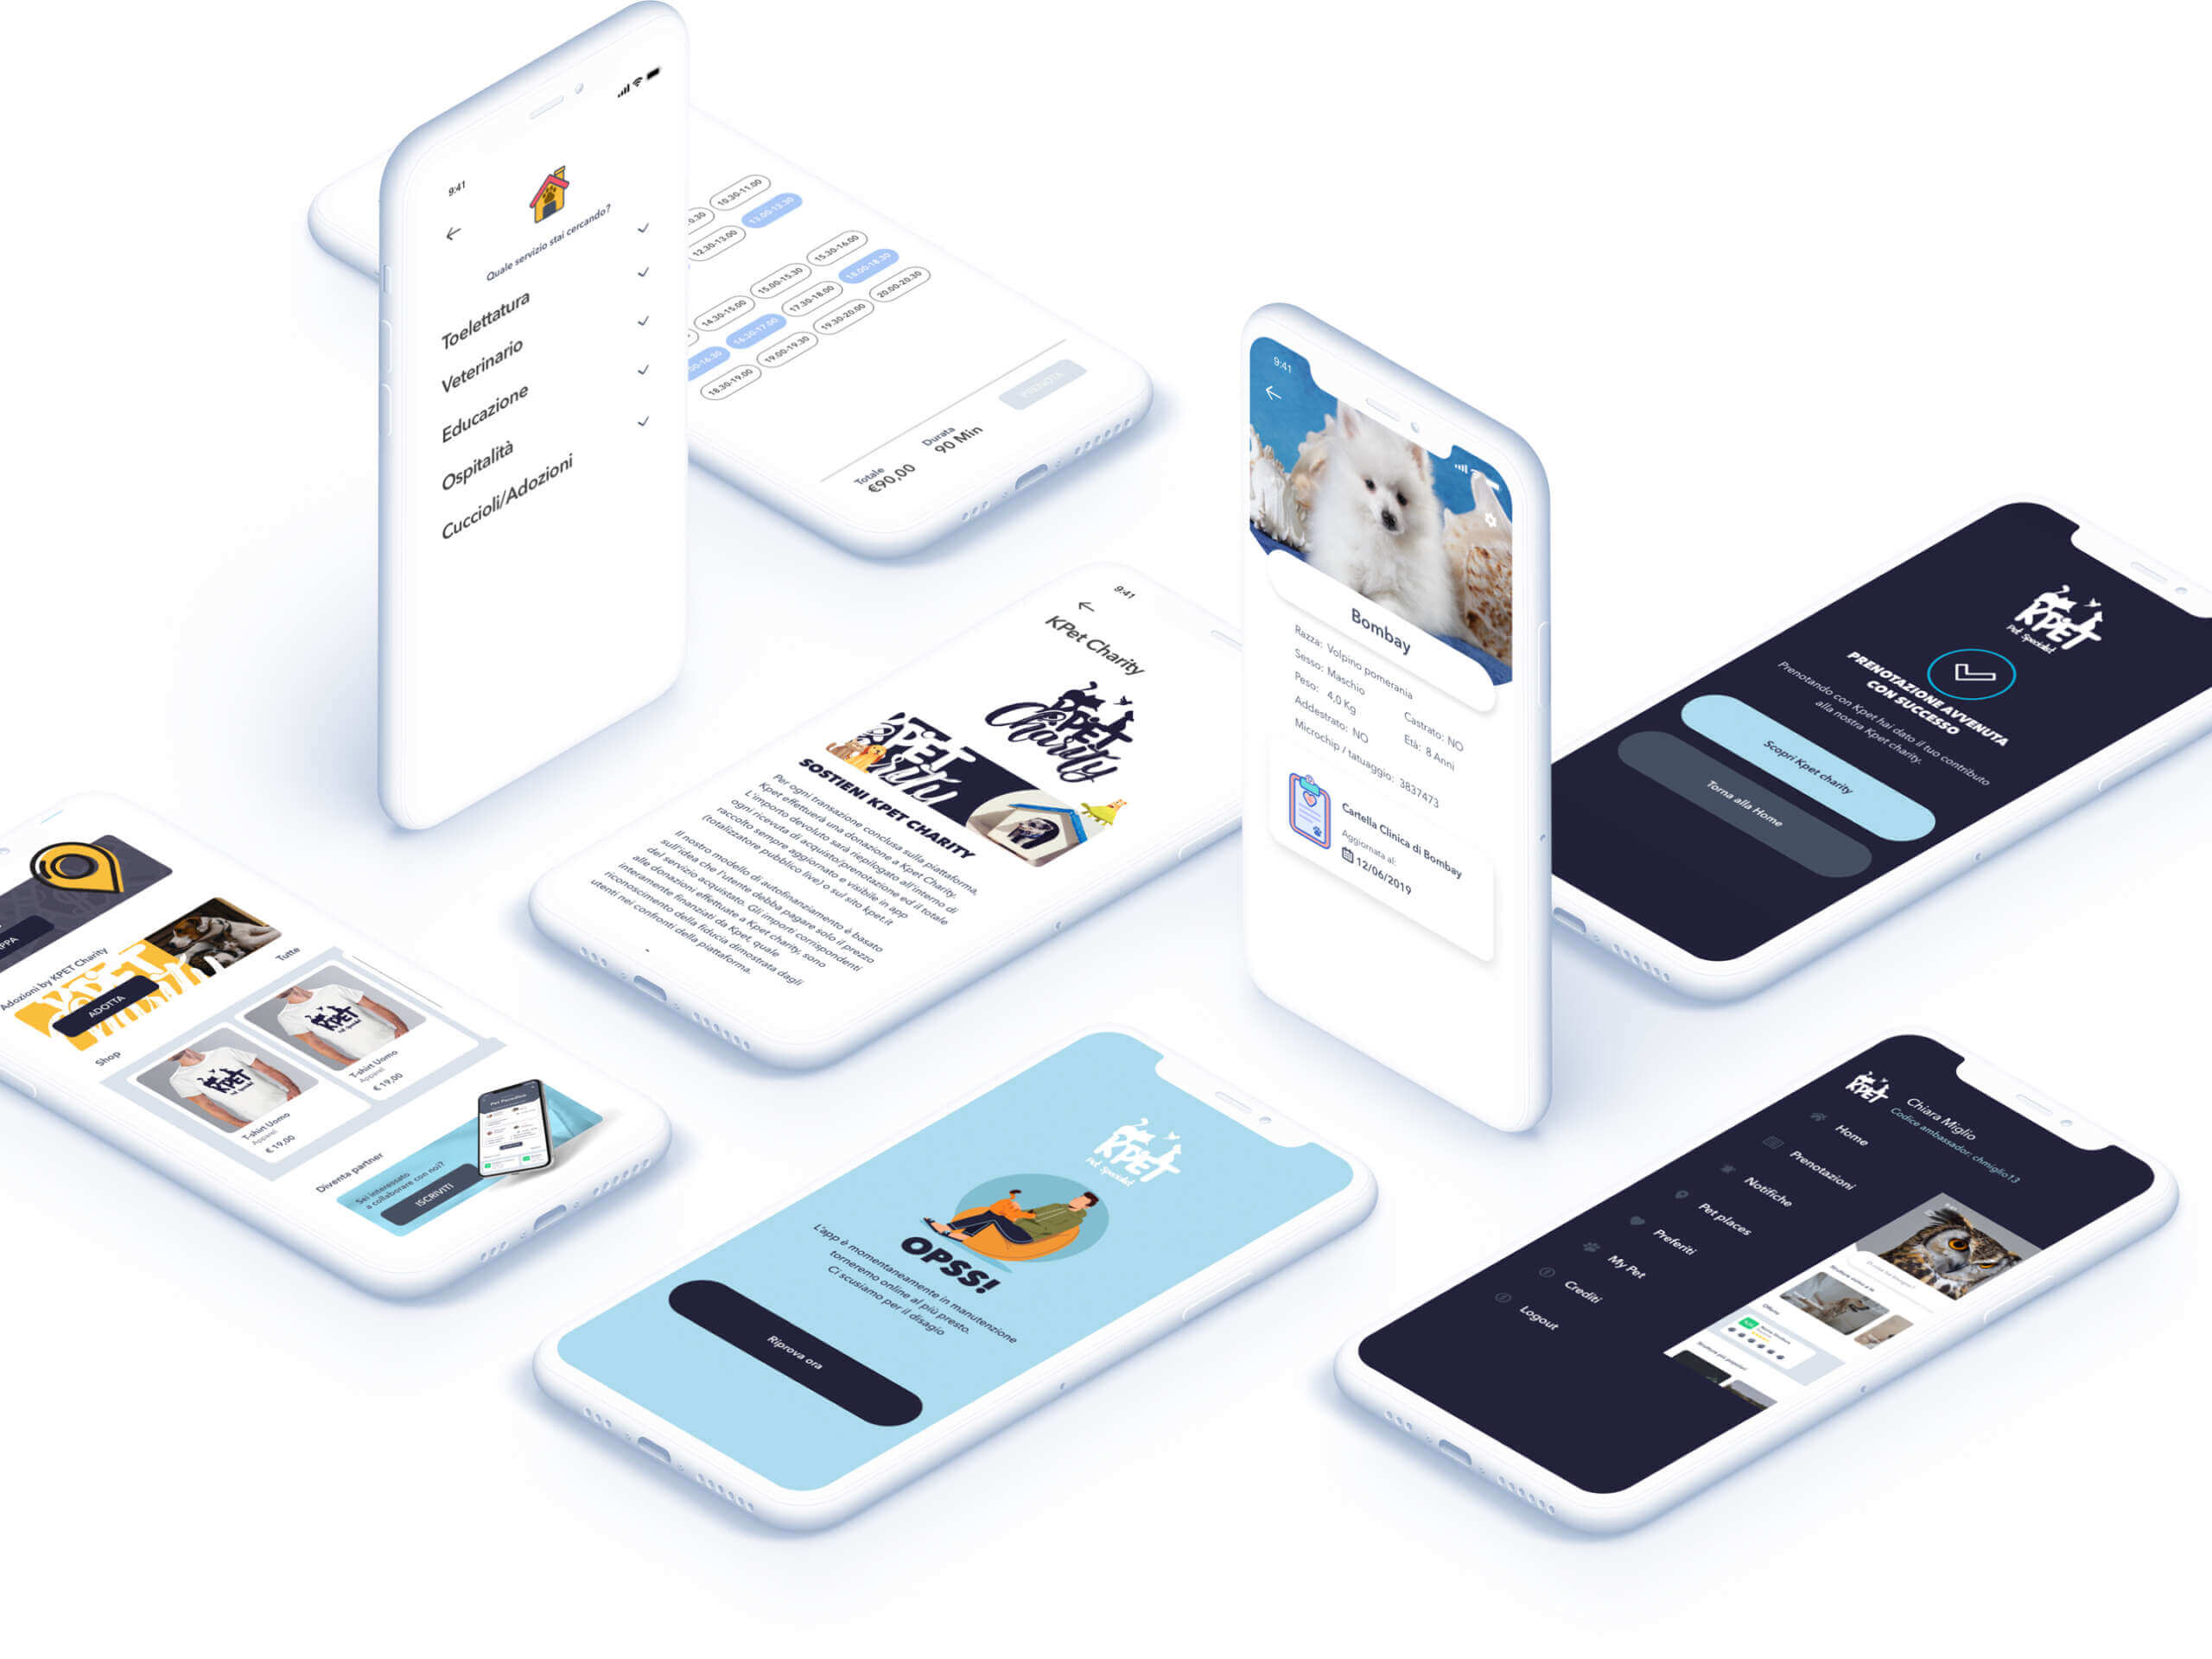 Kpet - App utente - Carpediem srl